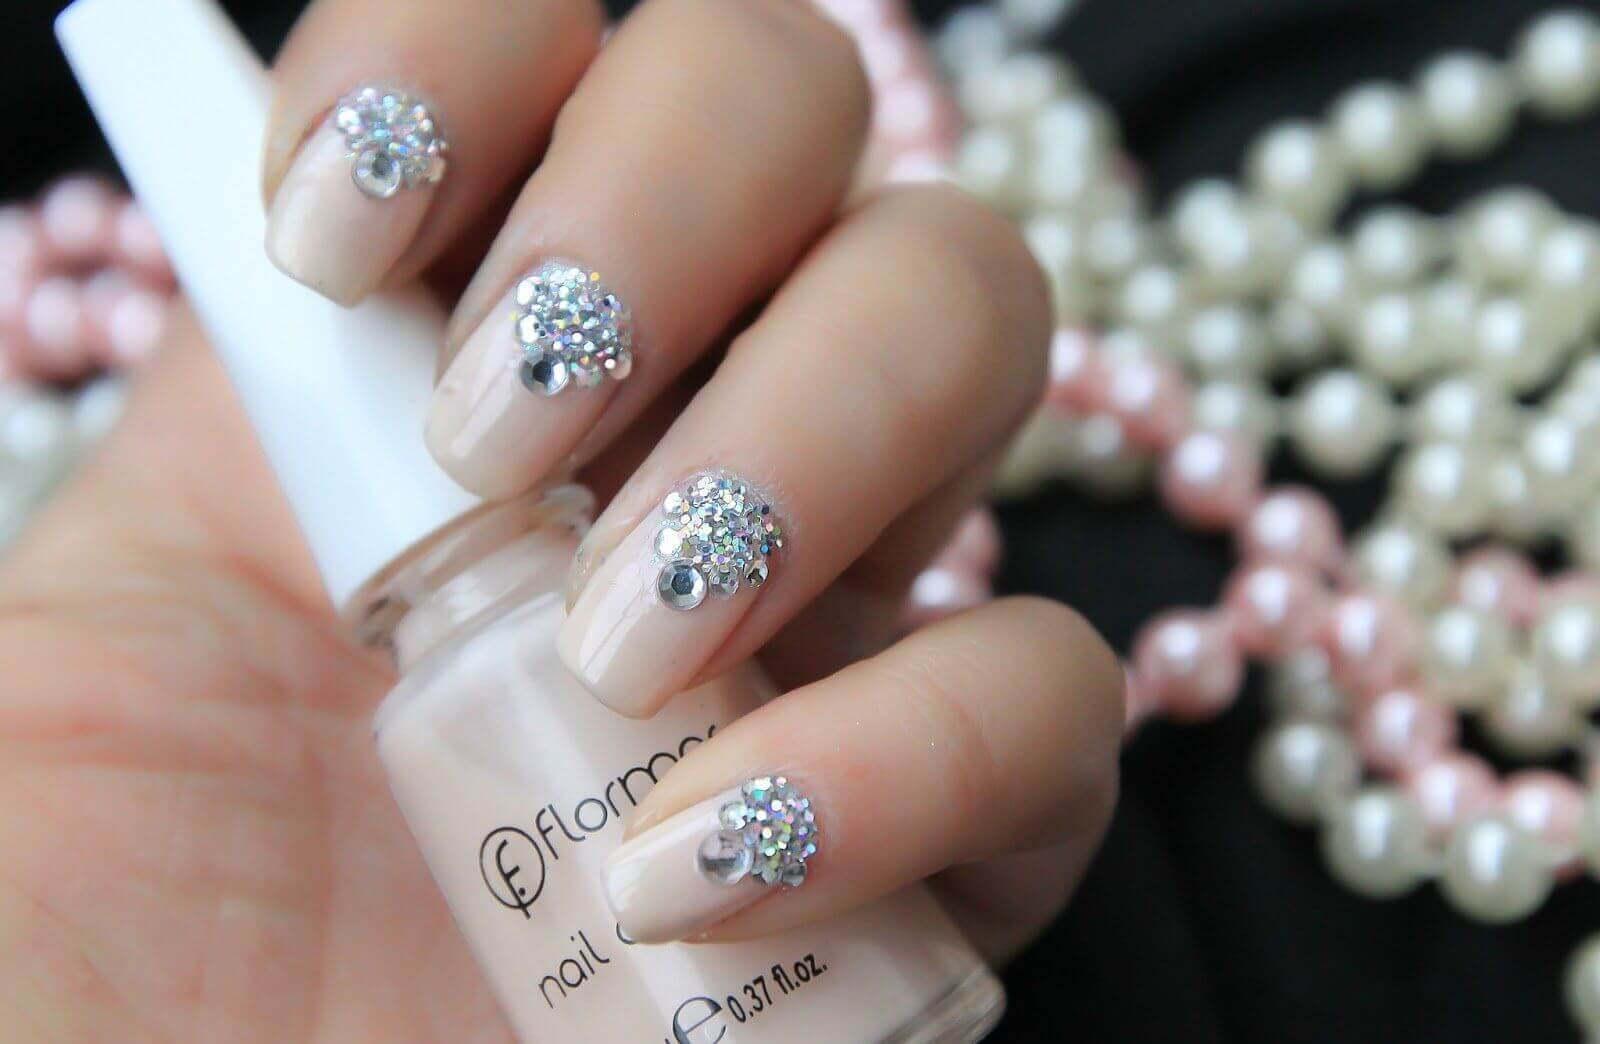 dessins d'ongles avec pierres